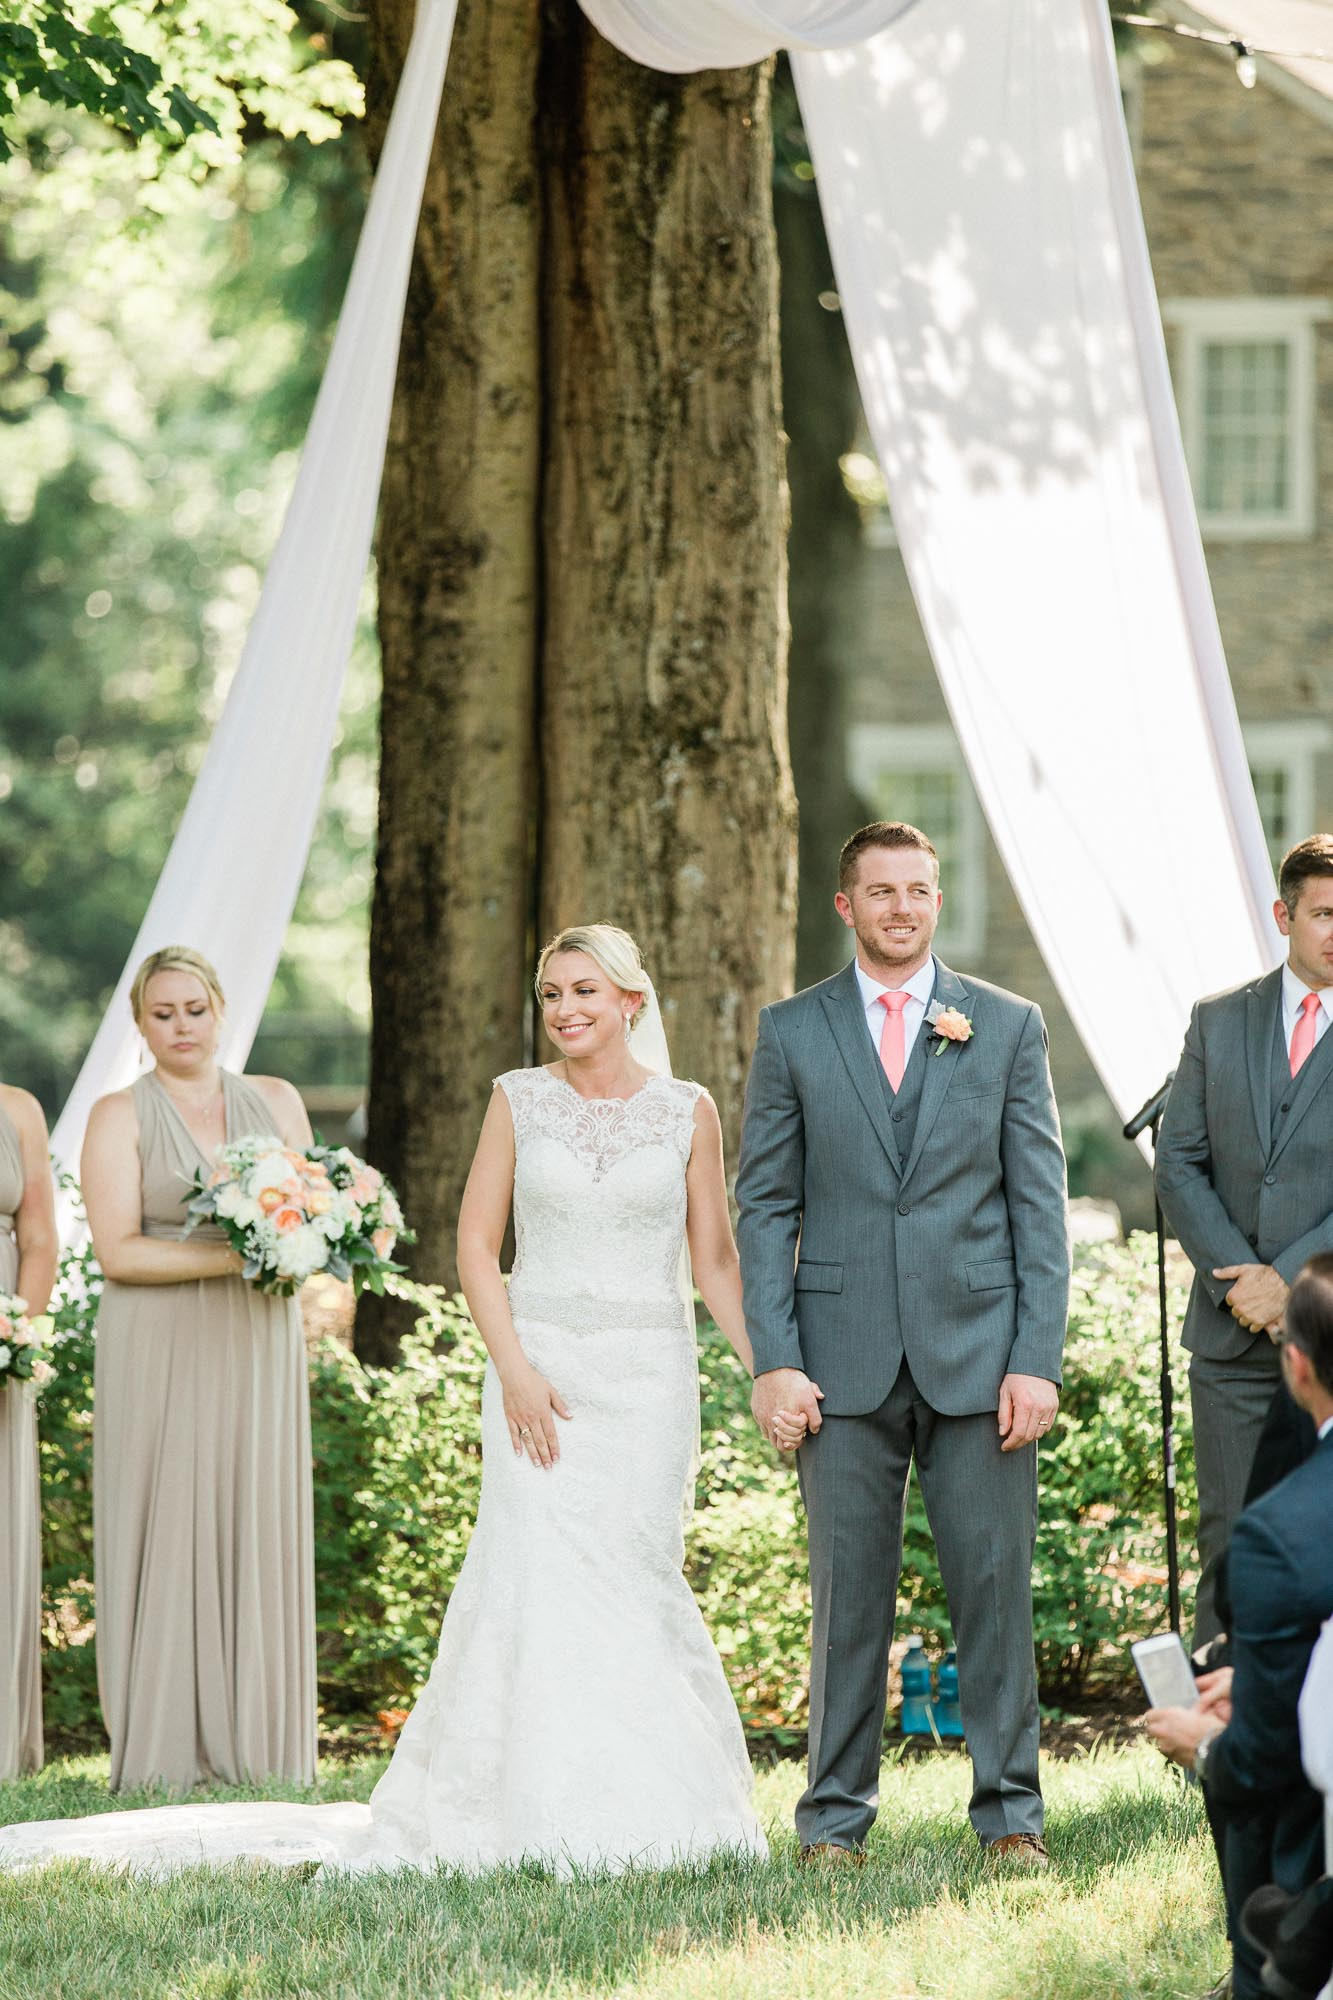 Allenberry-resort-historic-pennsylvania-wedding-22112.jpg